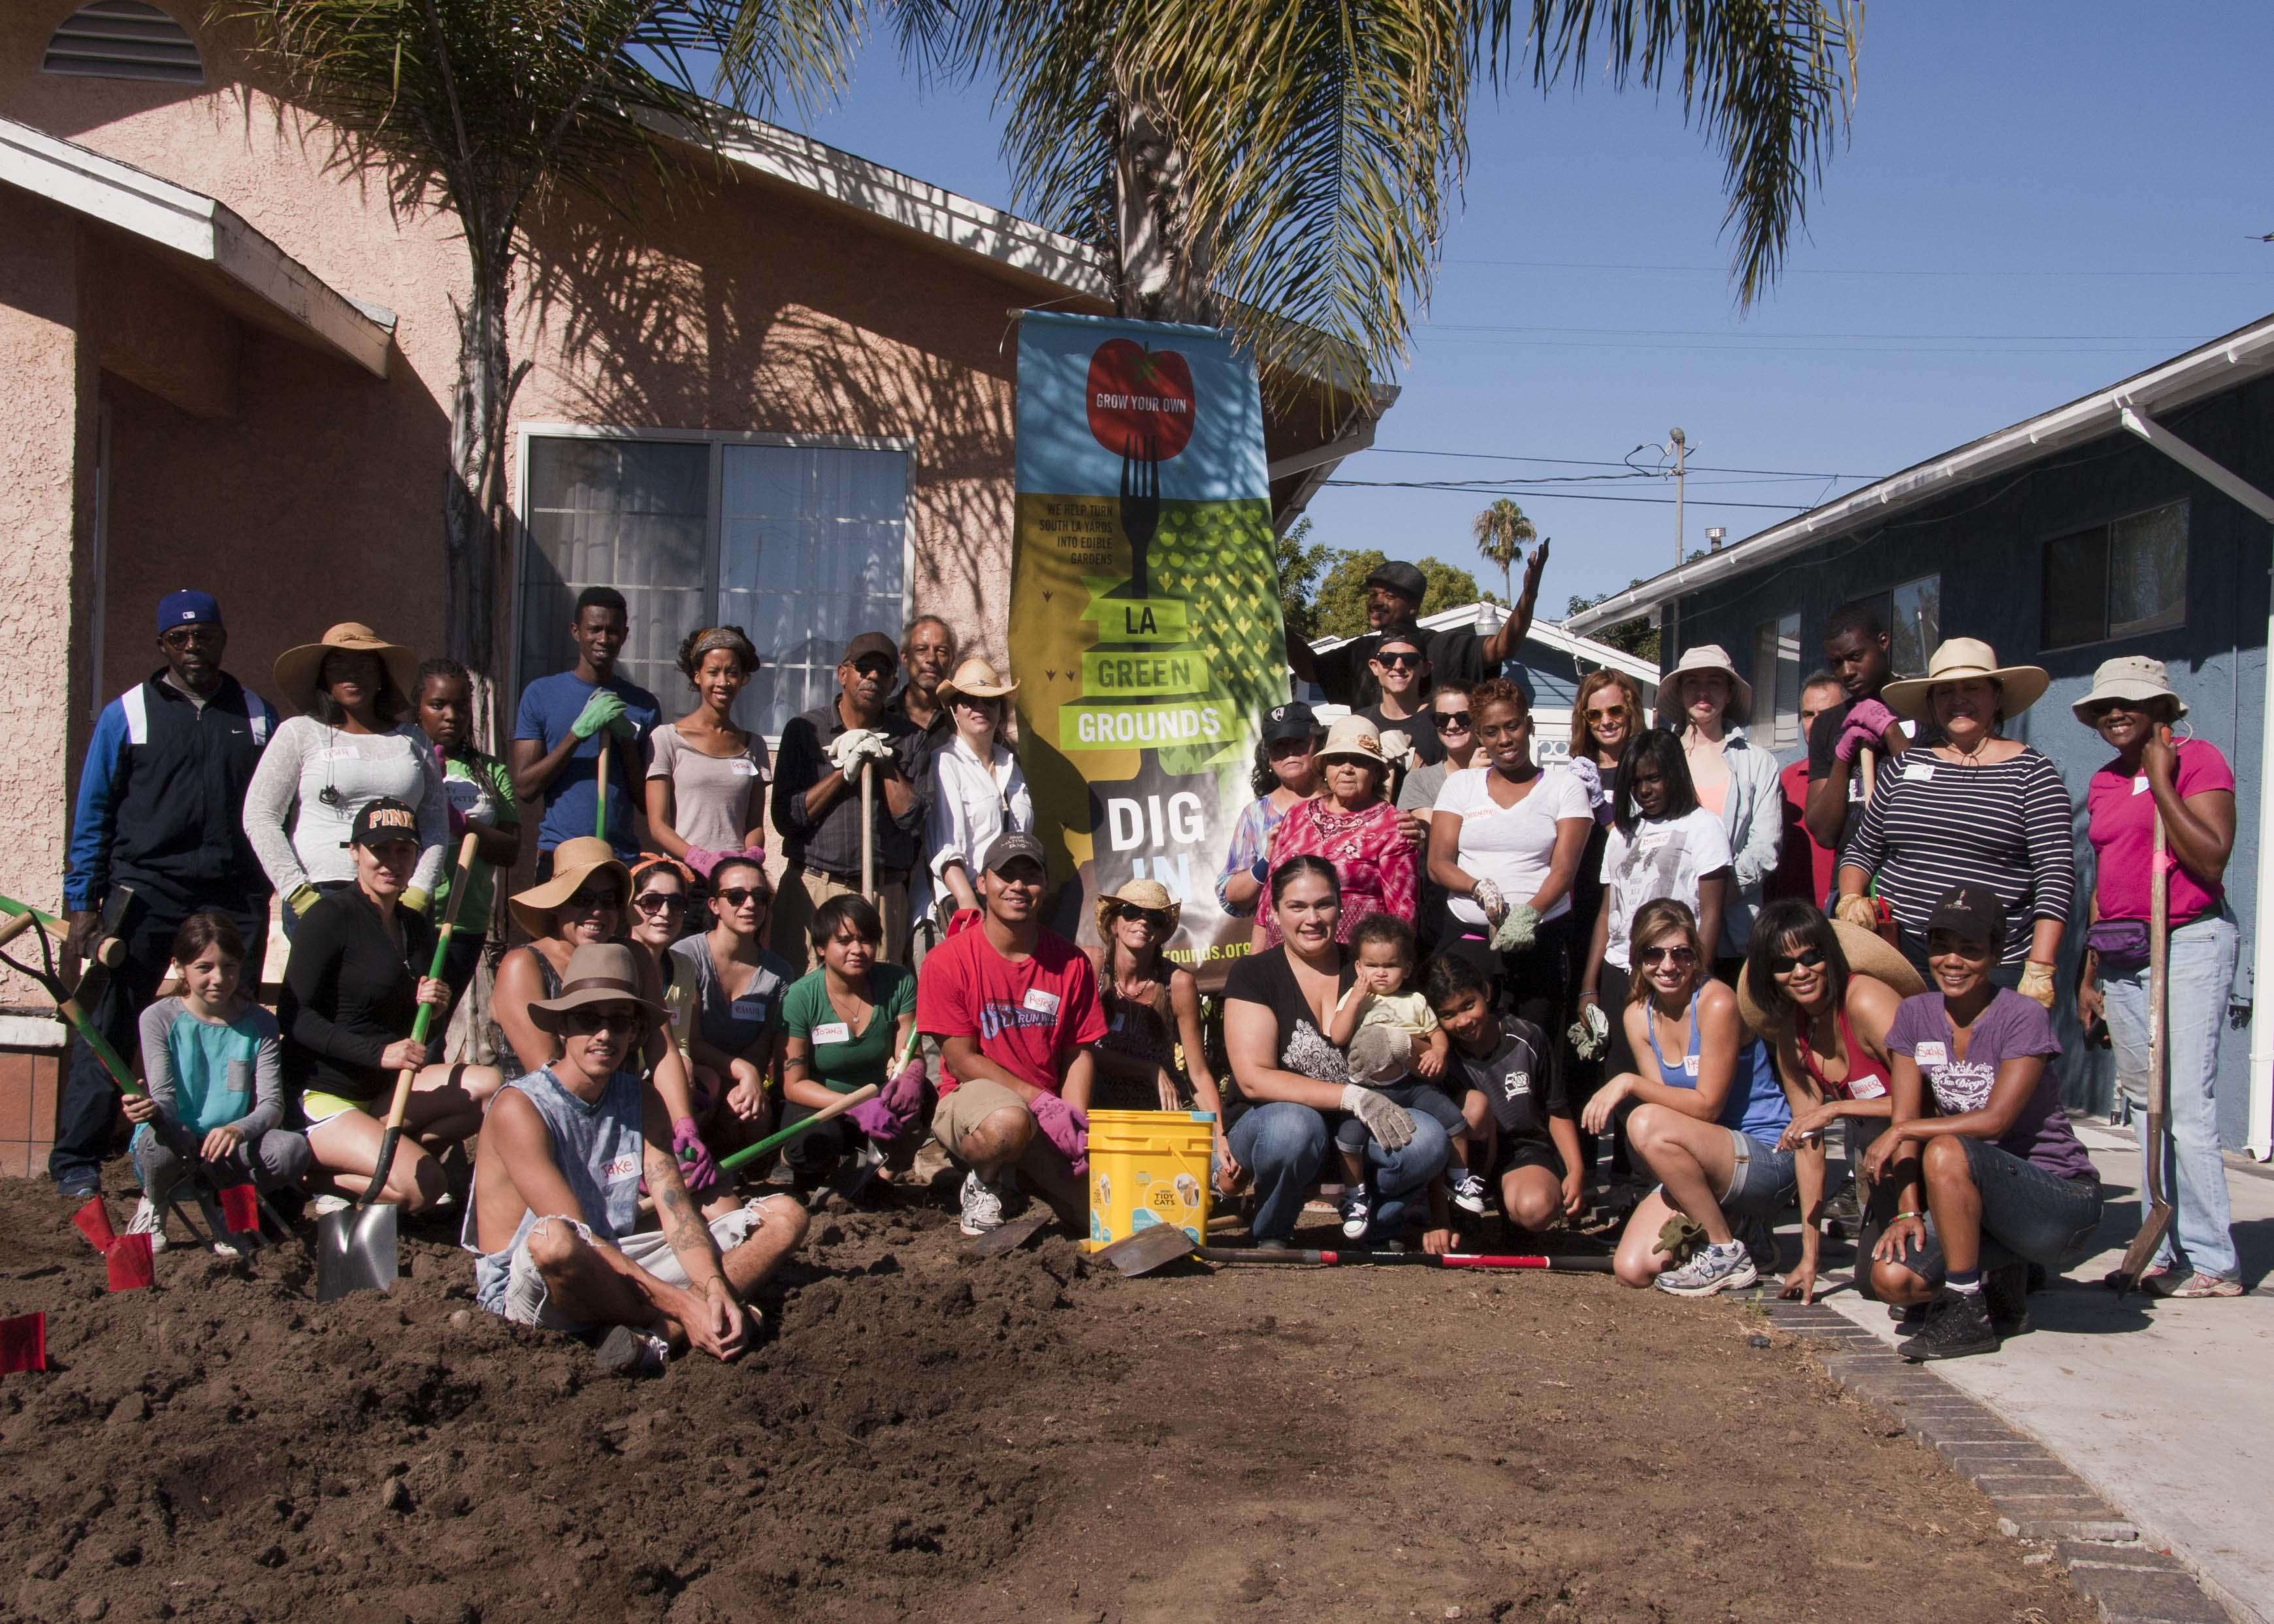 Rimpau St. Dig-in Sept. 28, 2013